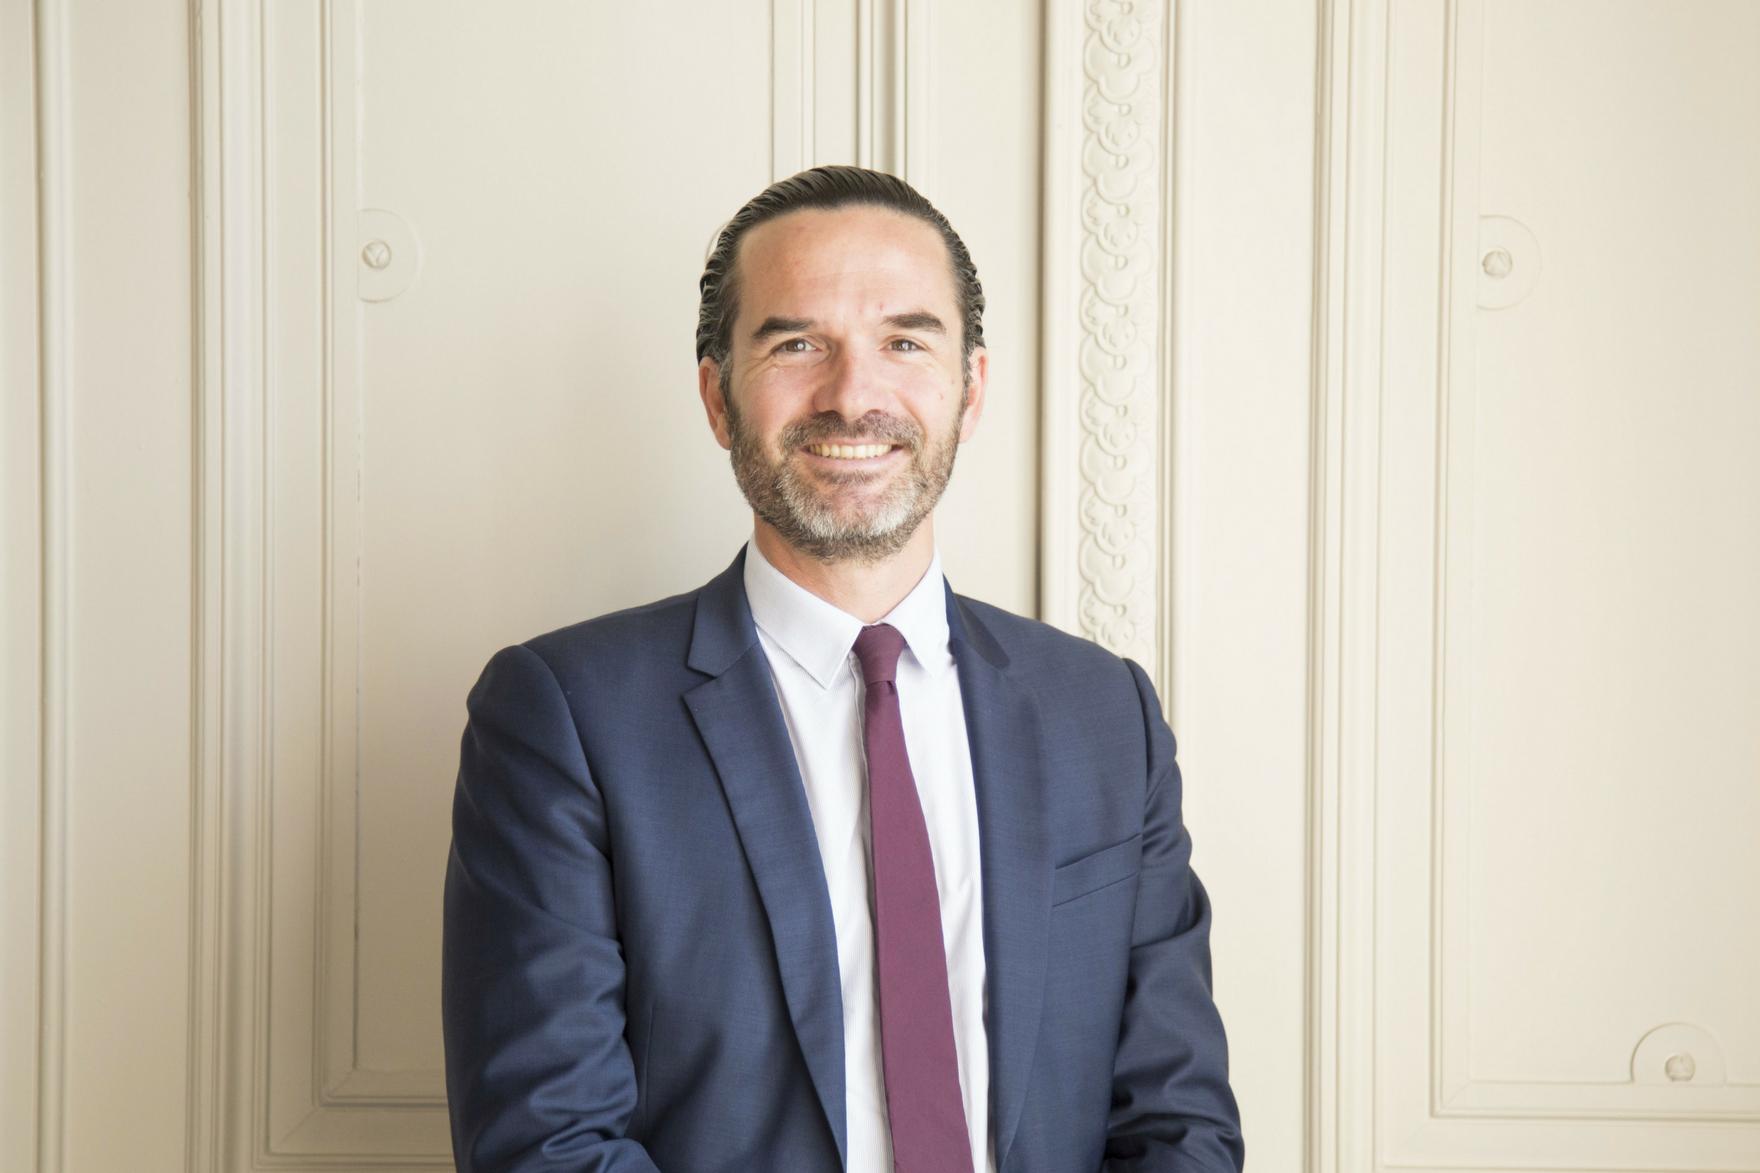 Guillaume Tiberghien